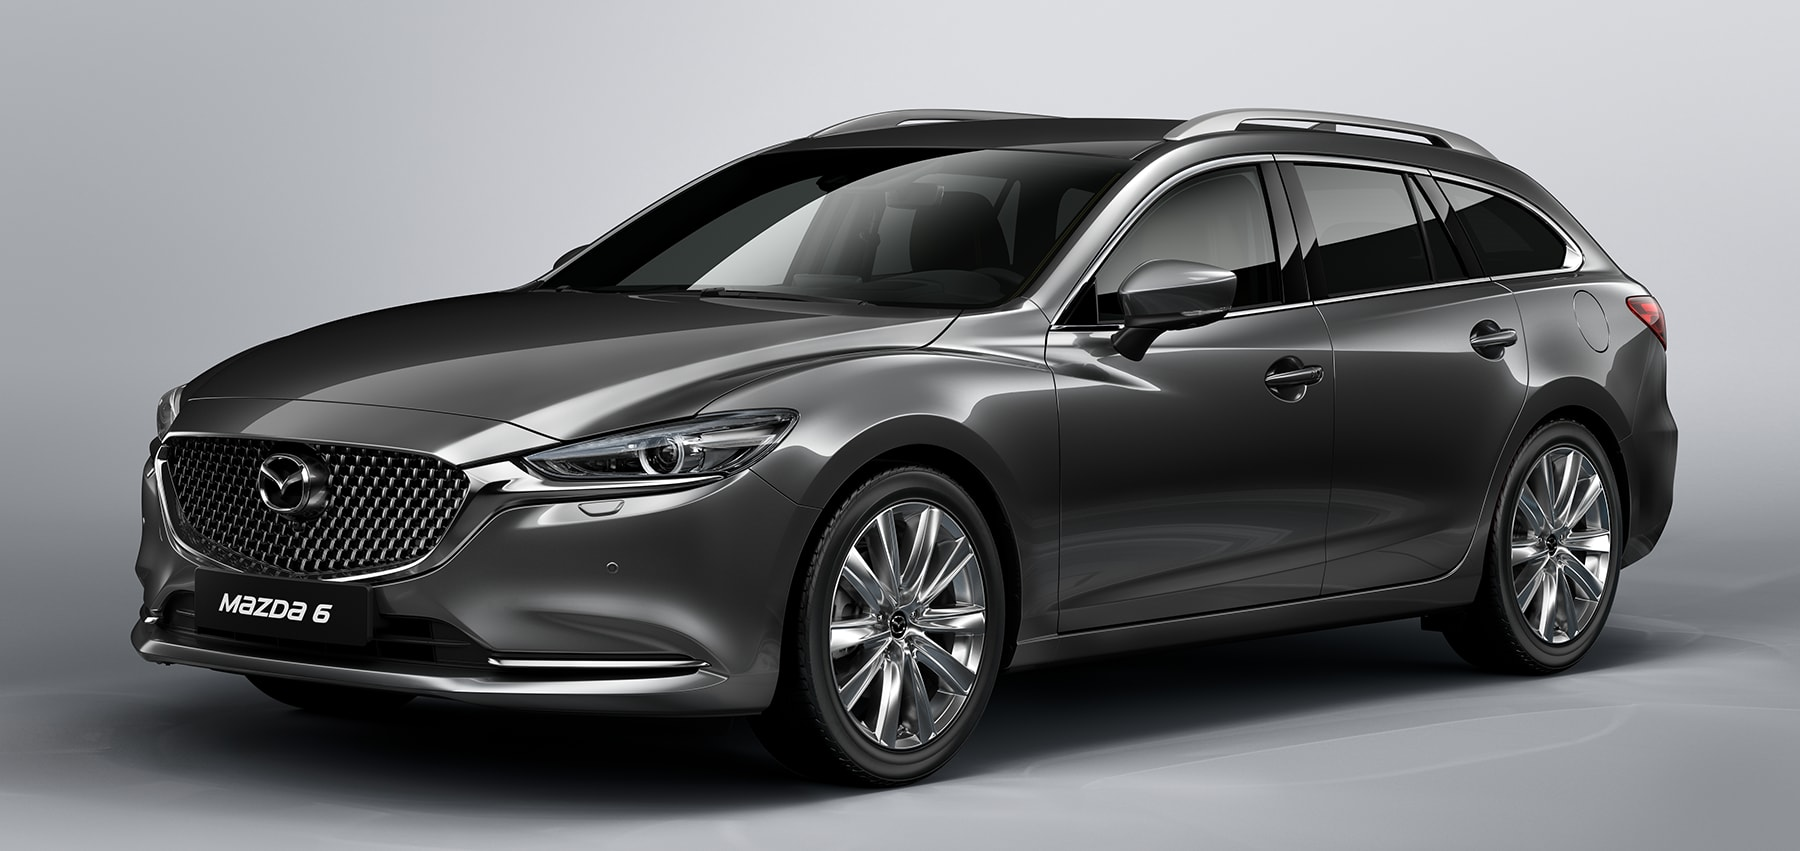 2020 Mazda 6s History